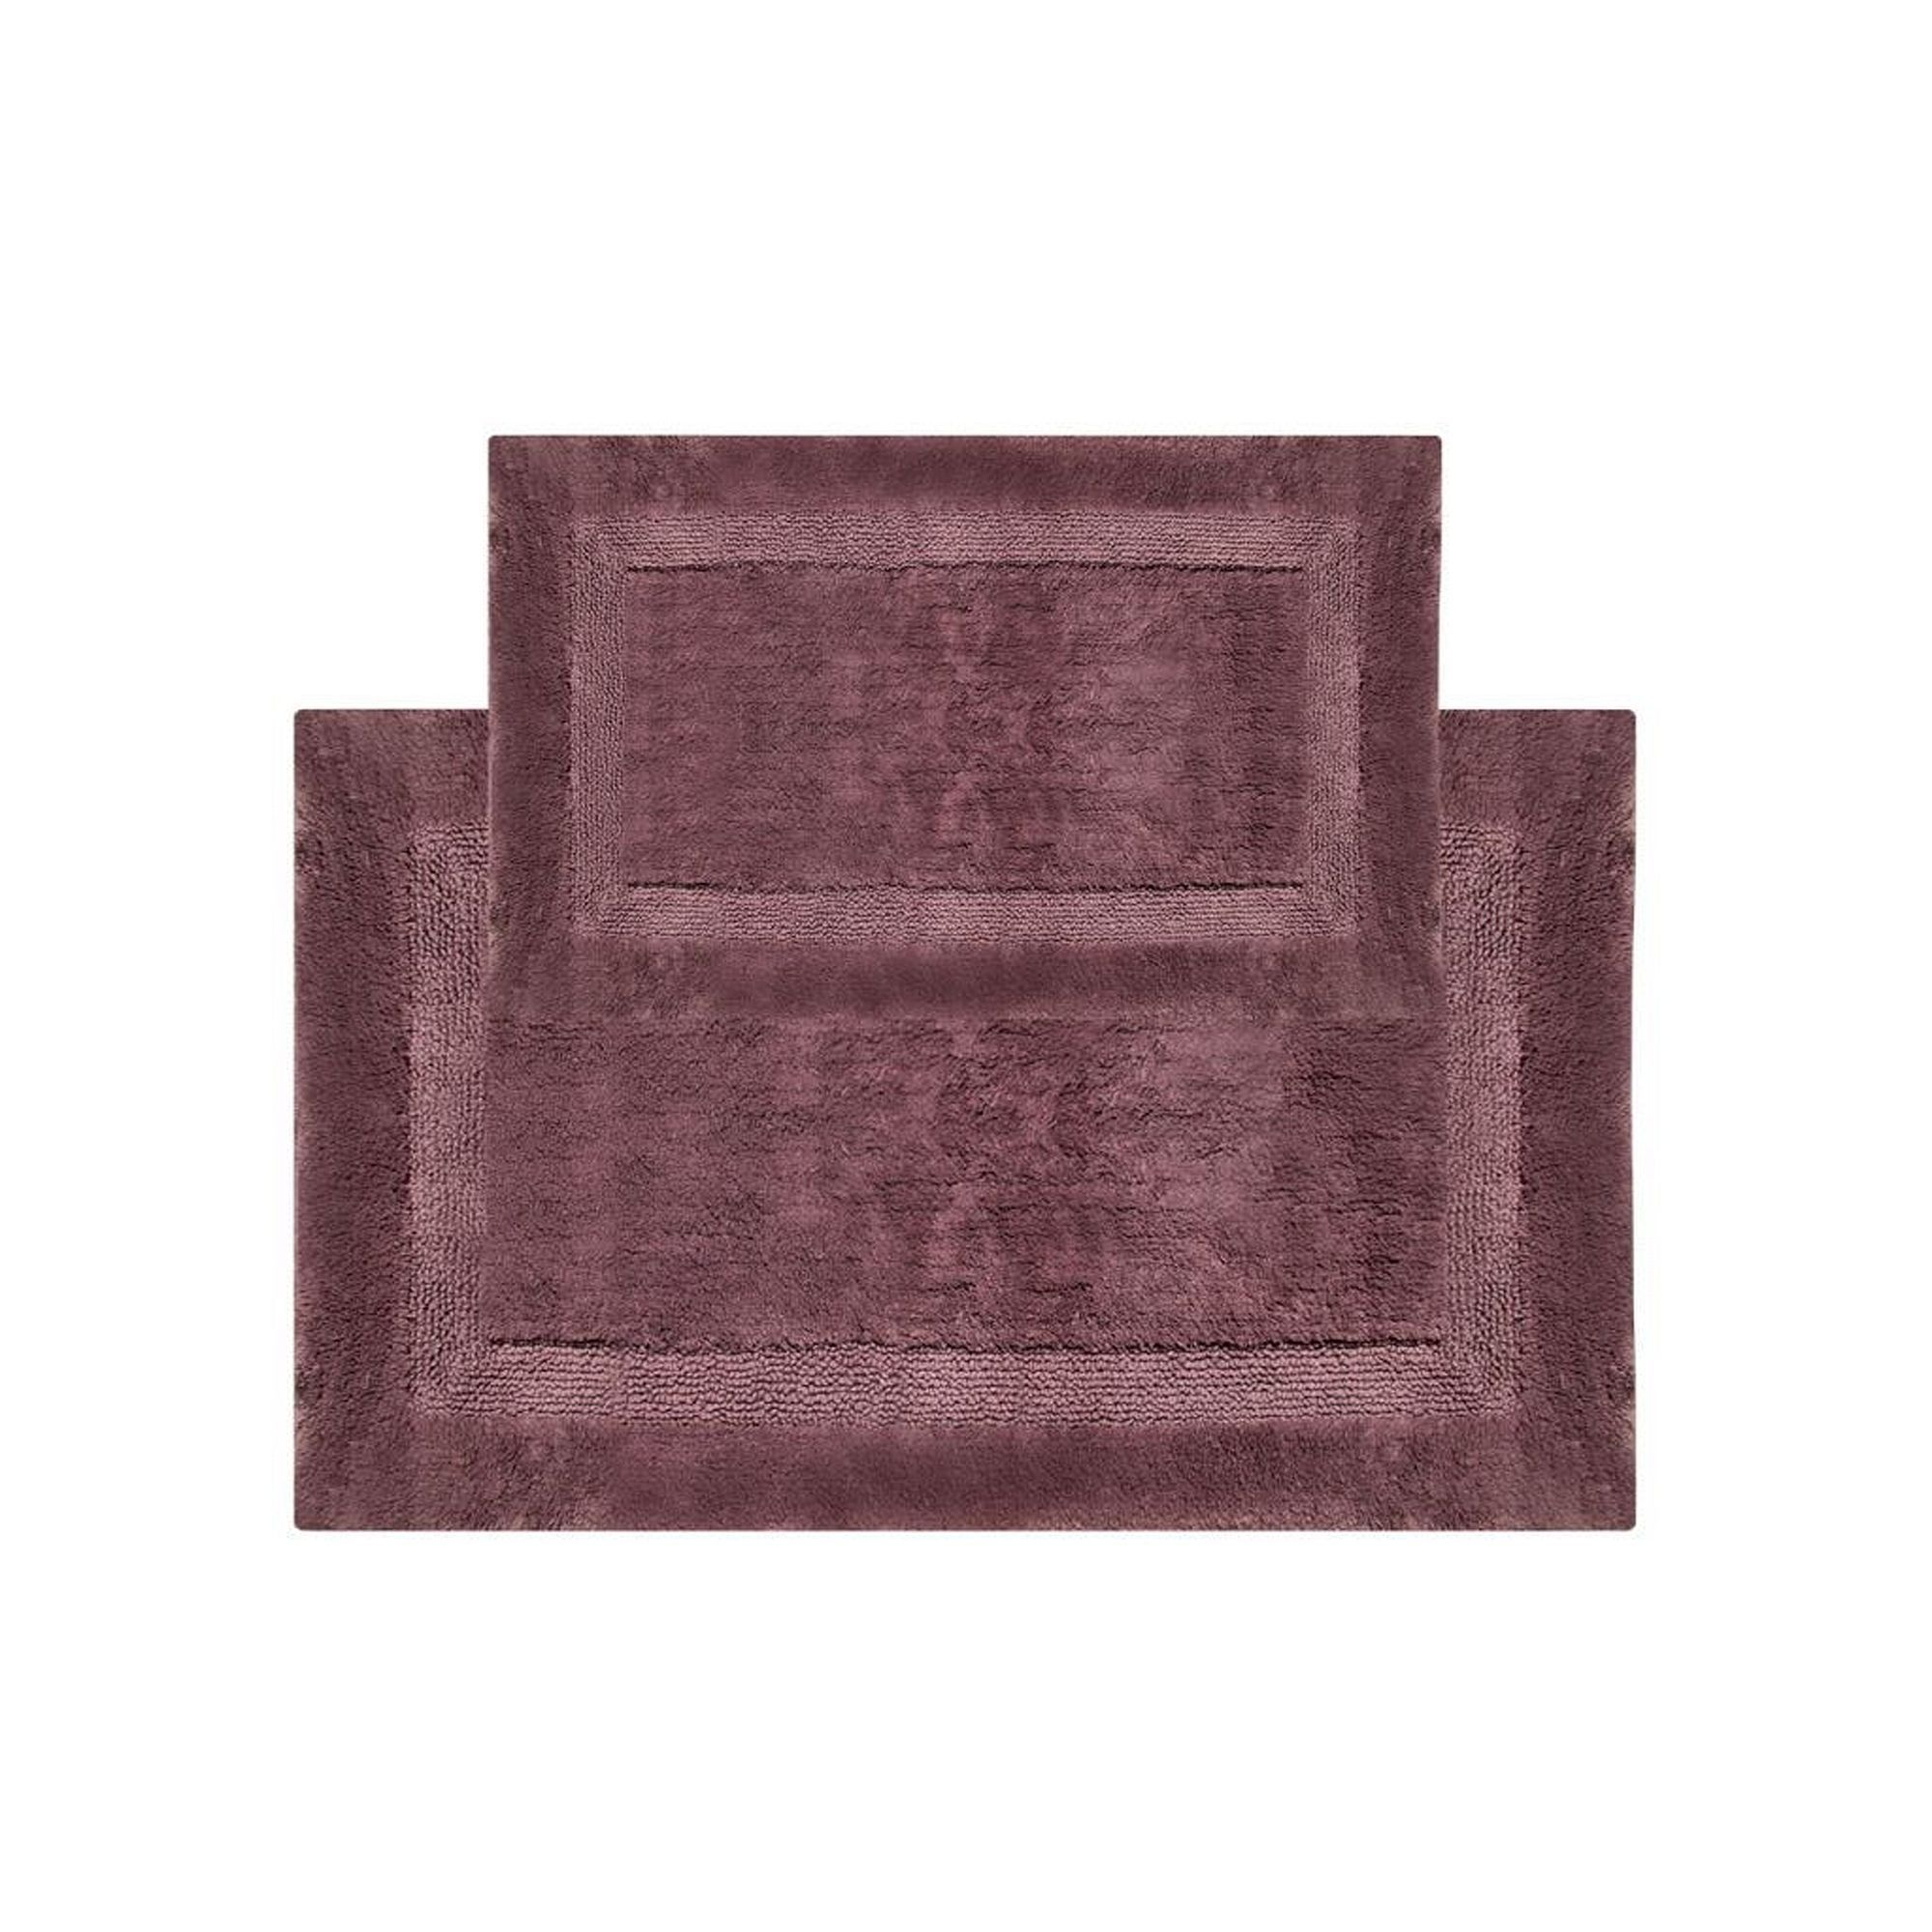 chandra pad x rug mat plush in cream braided shag mats gray clearance custom purple dalyn area bathroom washable white bath rugs blue ribbon ikea most chenille cheap